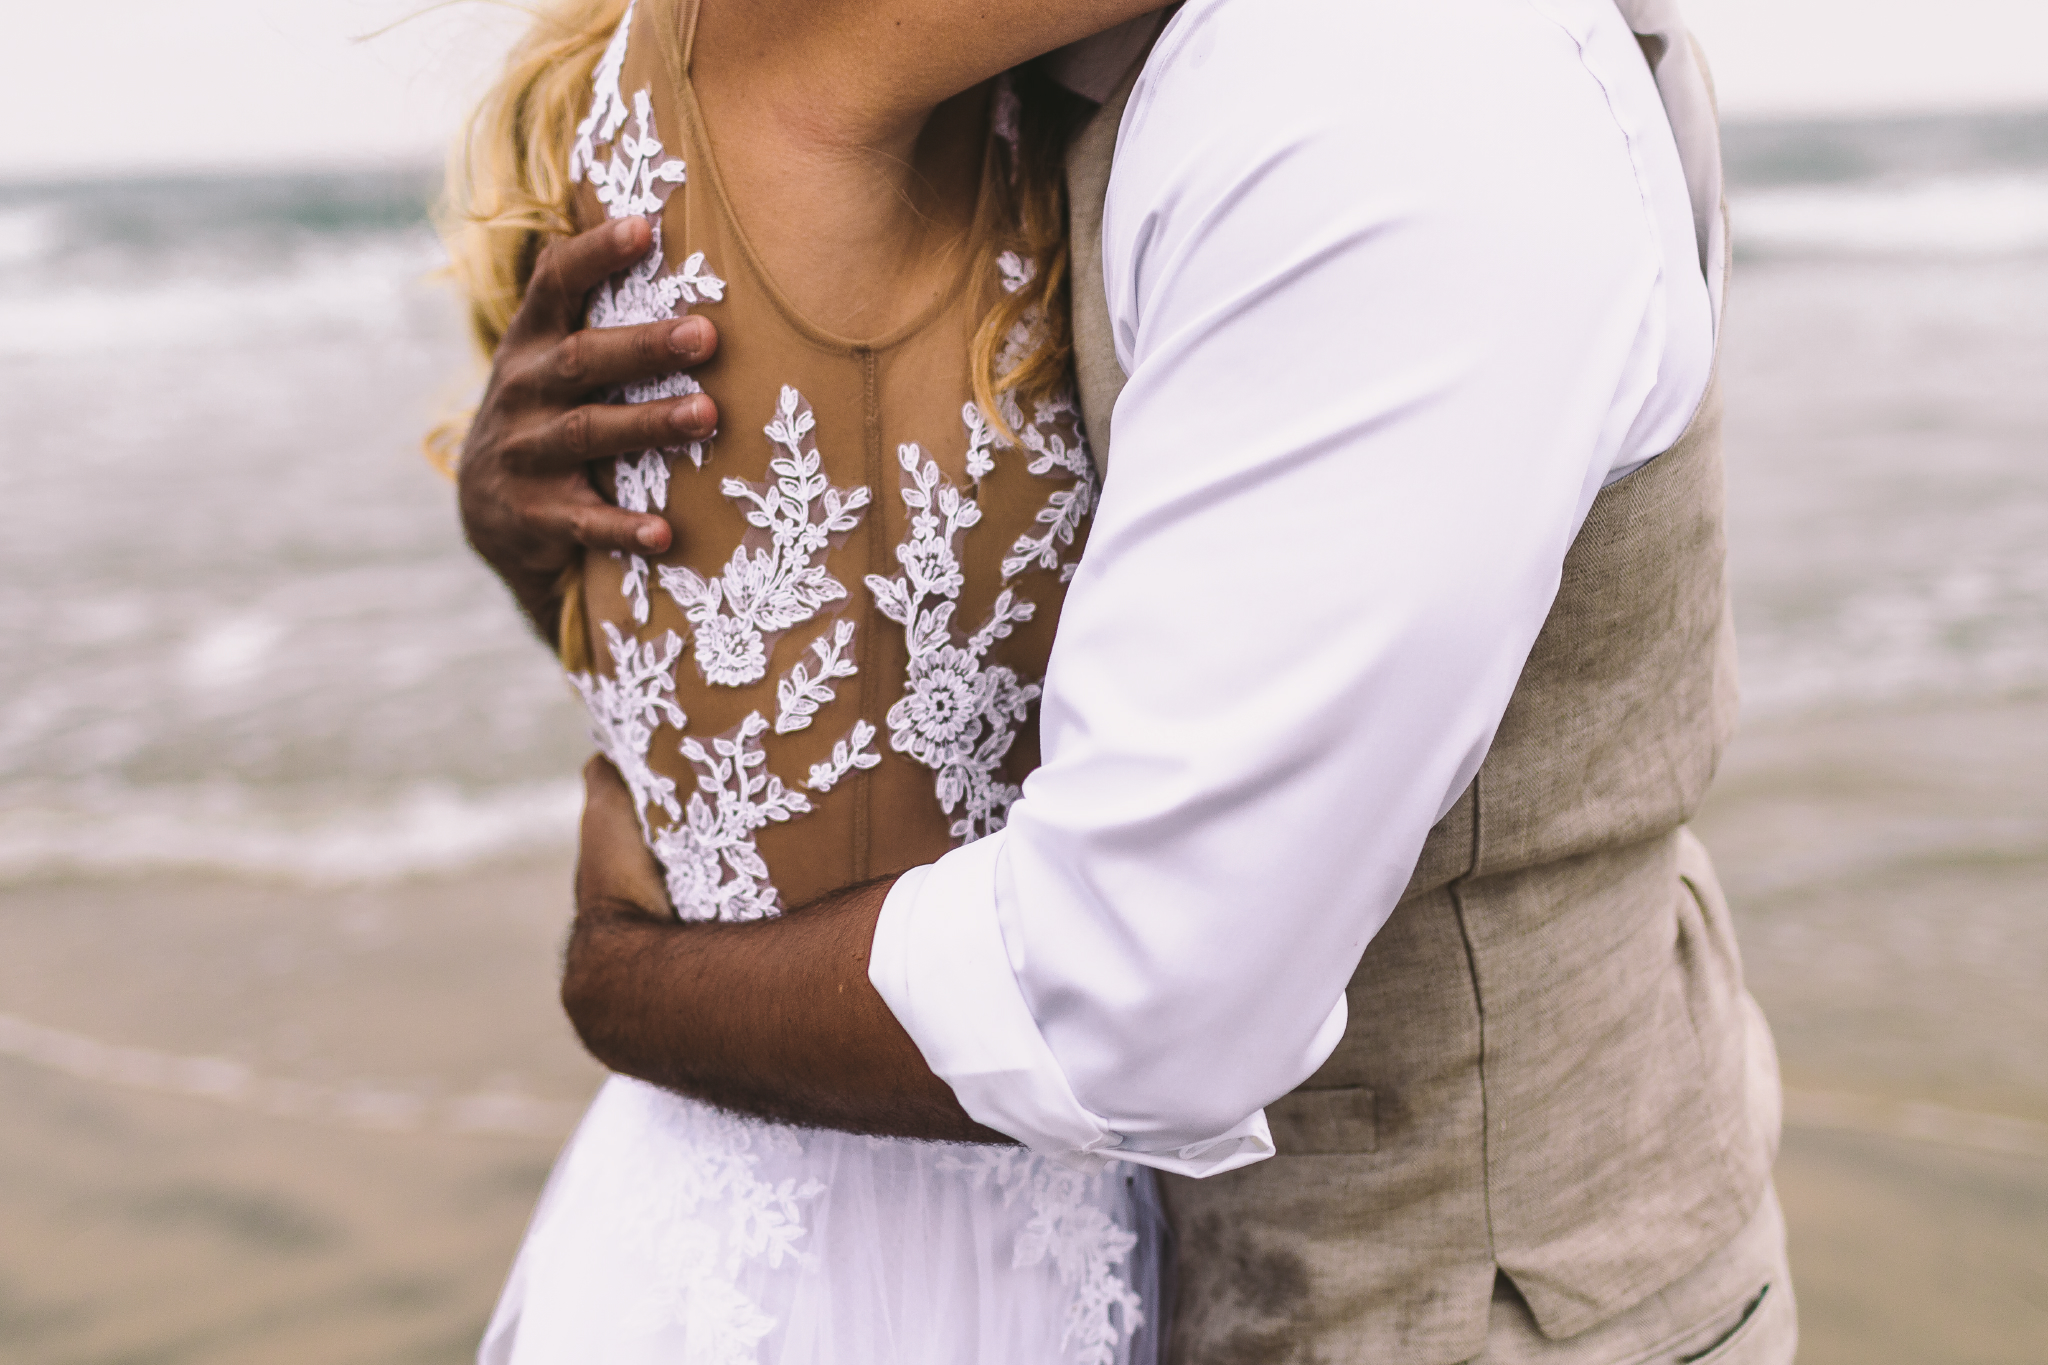 san diego wedding   photographer | shot of married couple's torso while they hug on beach shore